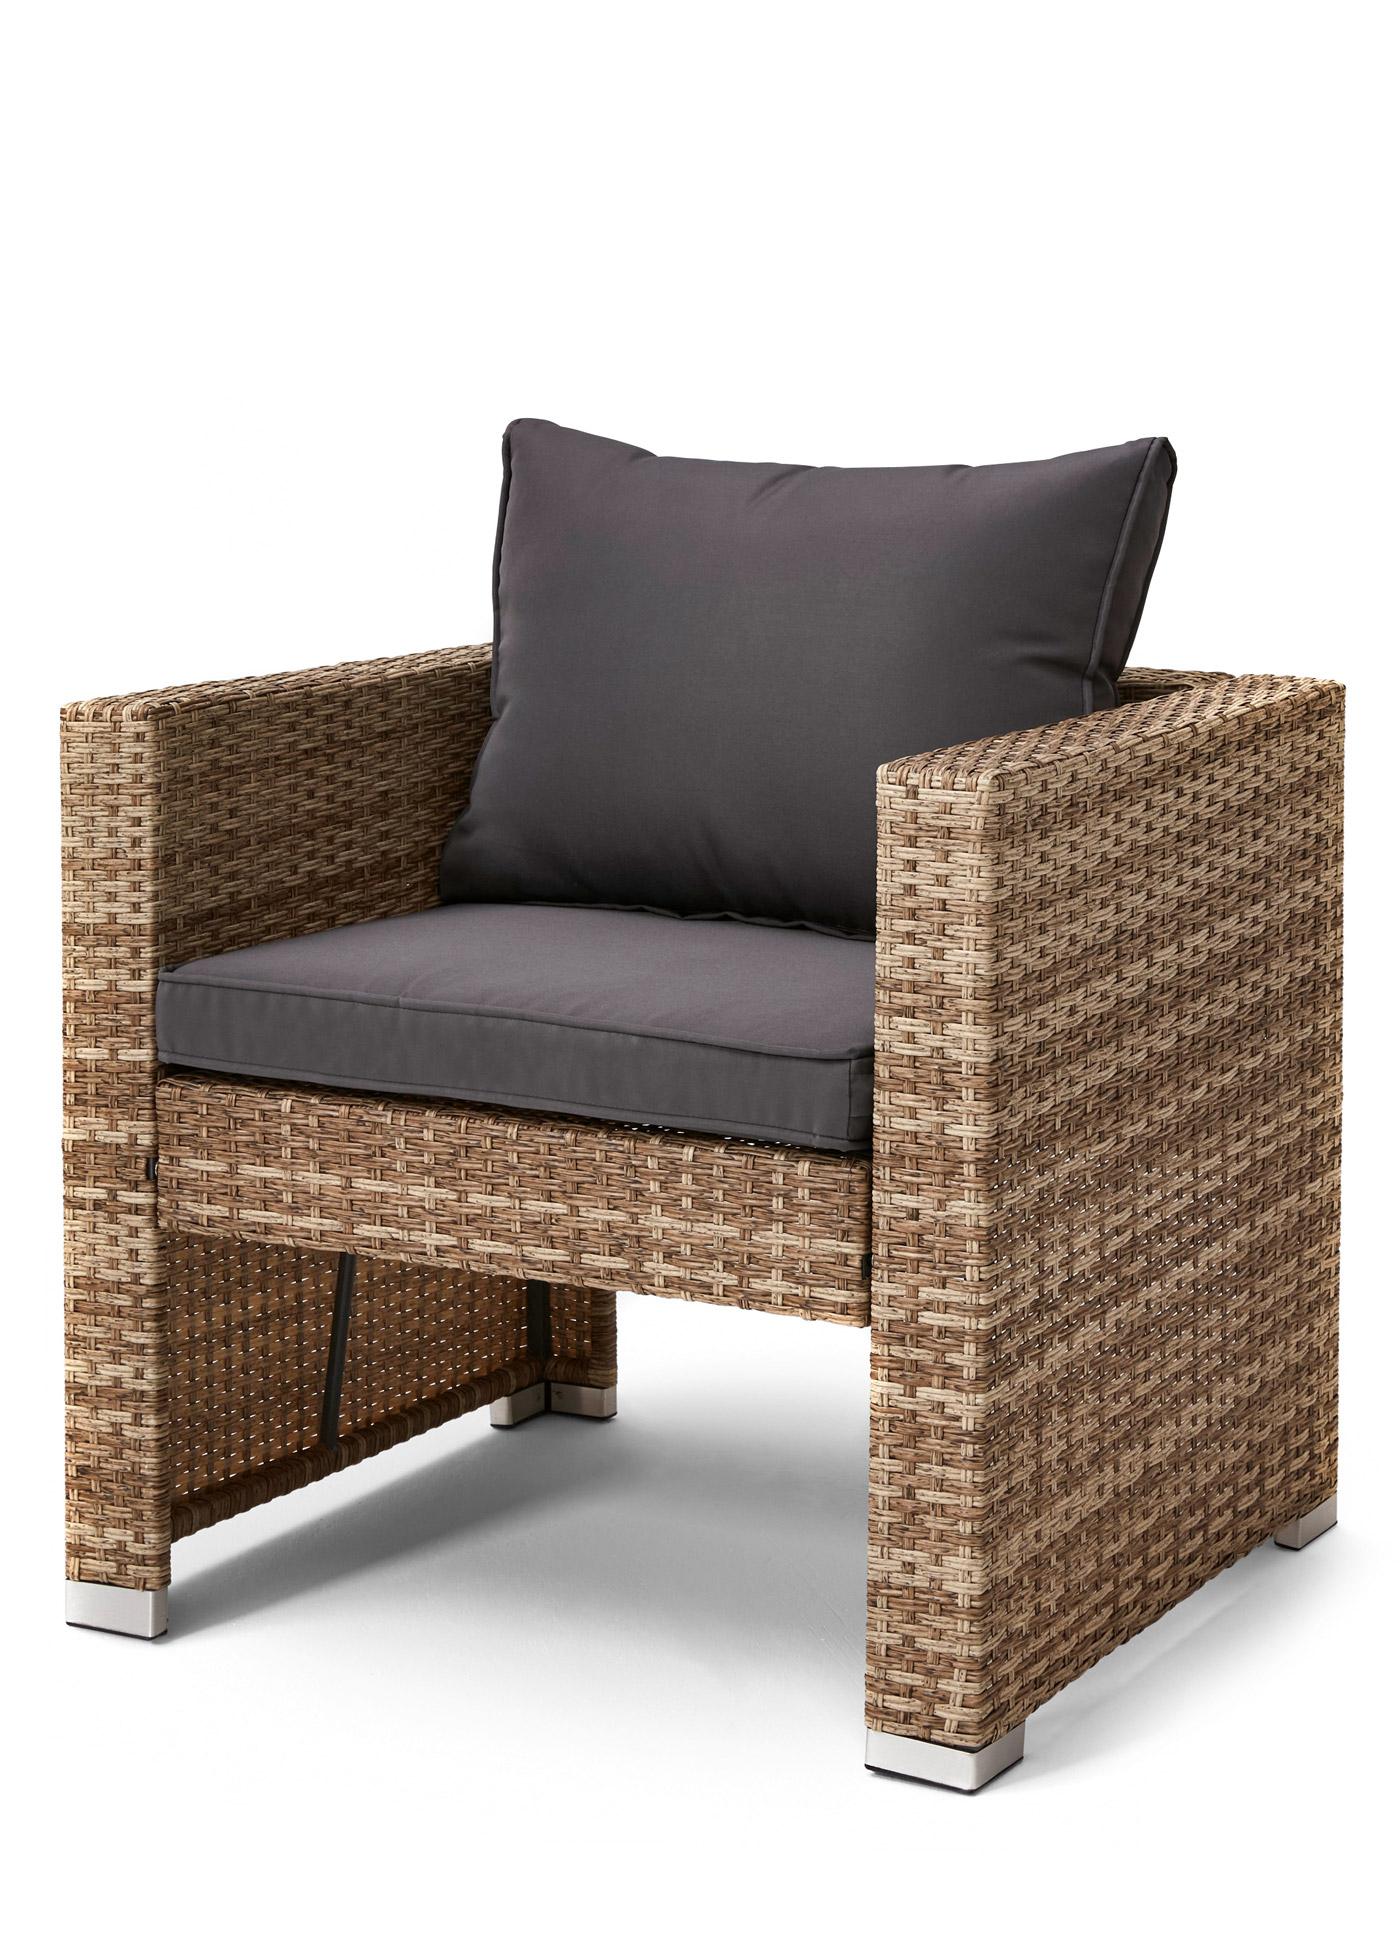 "*NEU*: Lounge-Sessel ""Nevio"" aus Polyrattan, brasil"